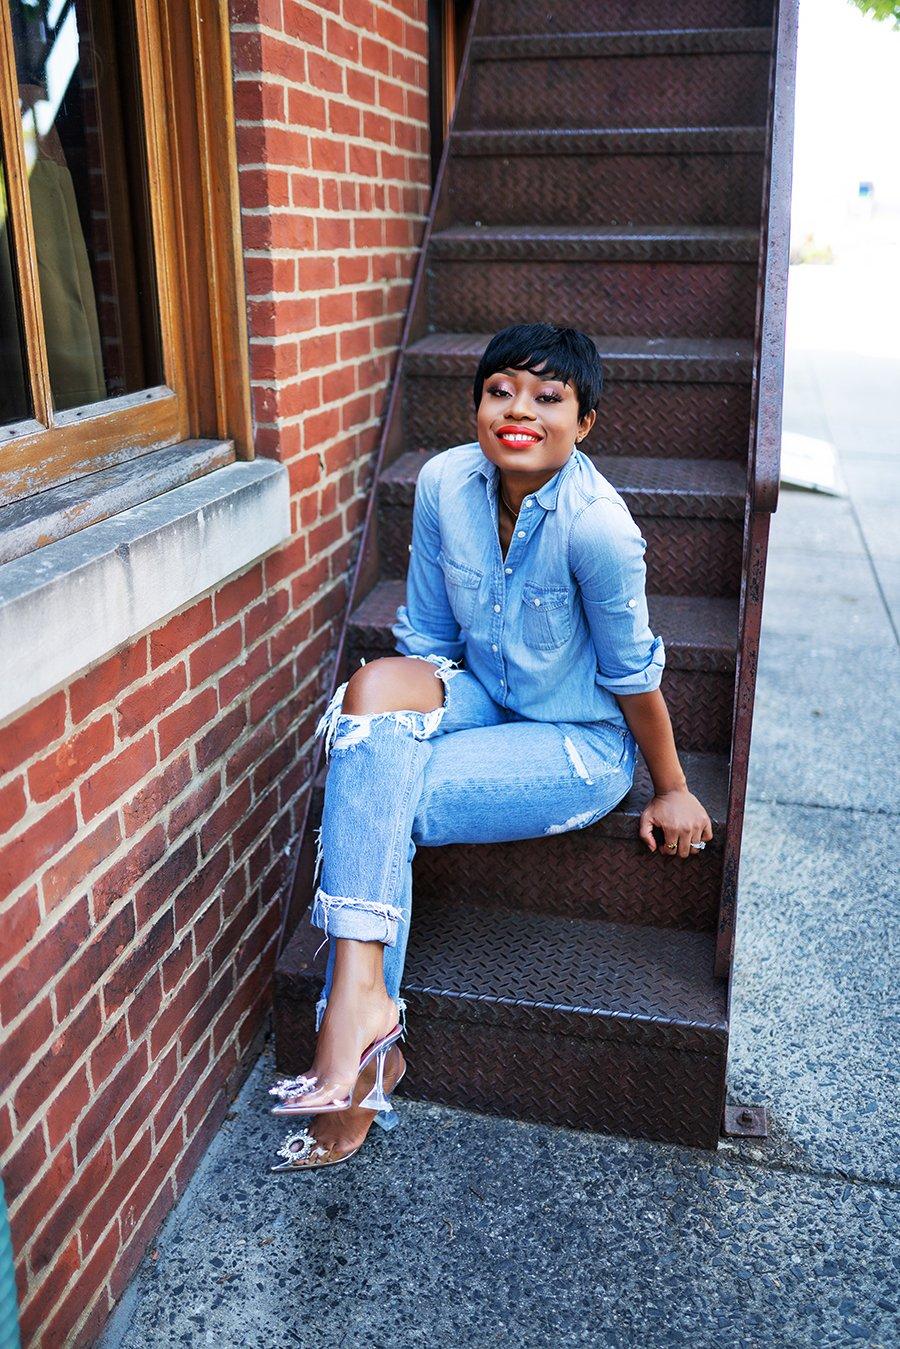 stella-adewunmi-of-jadore-fashion-blog-shares-how-to-look-chic-in-denim-on-denim